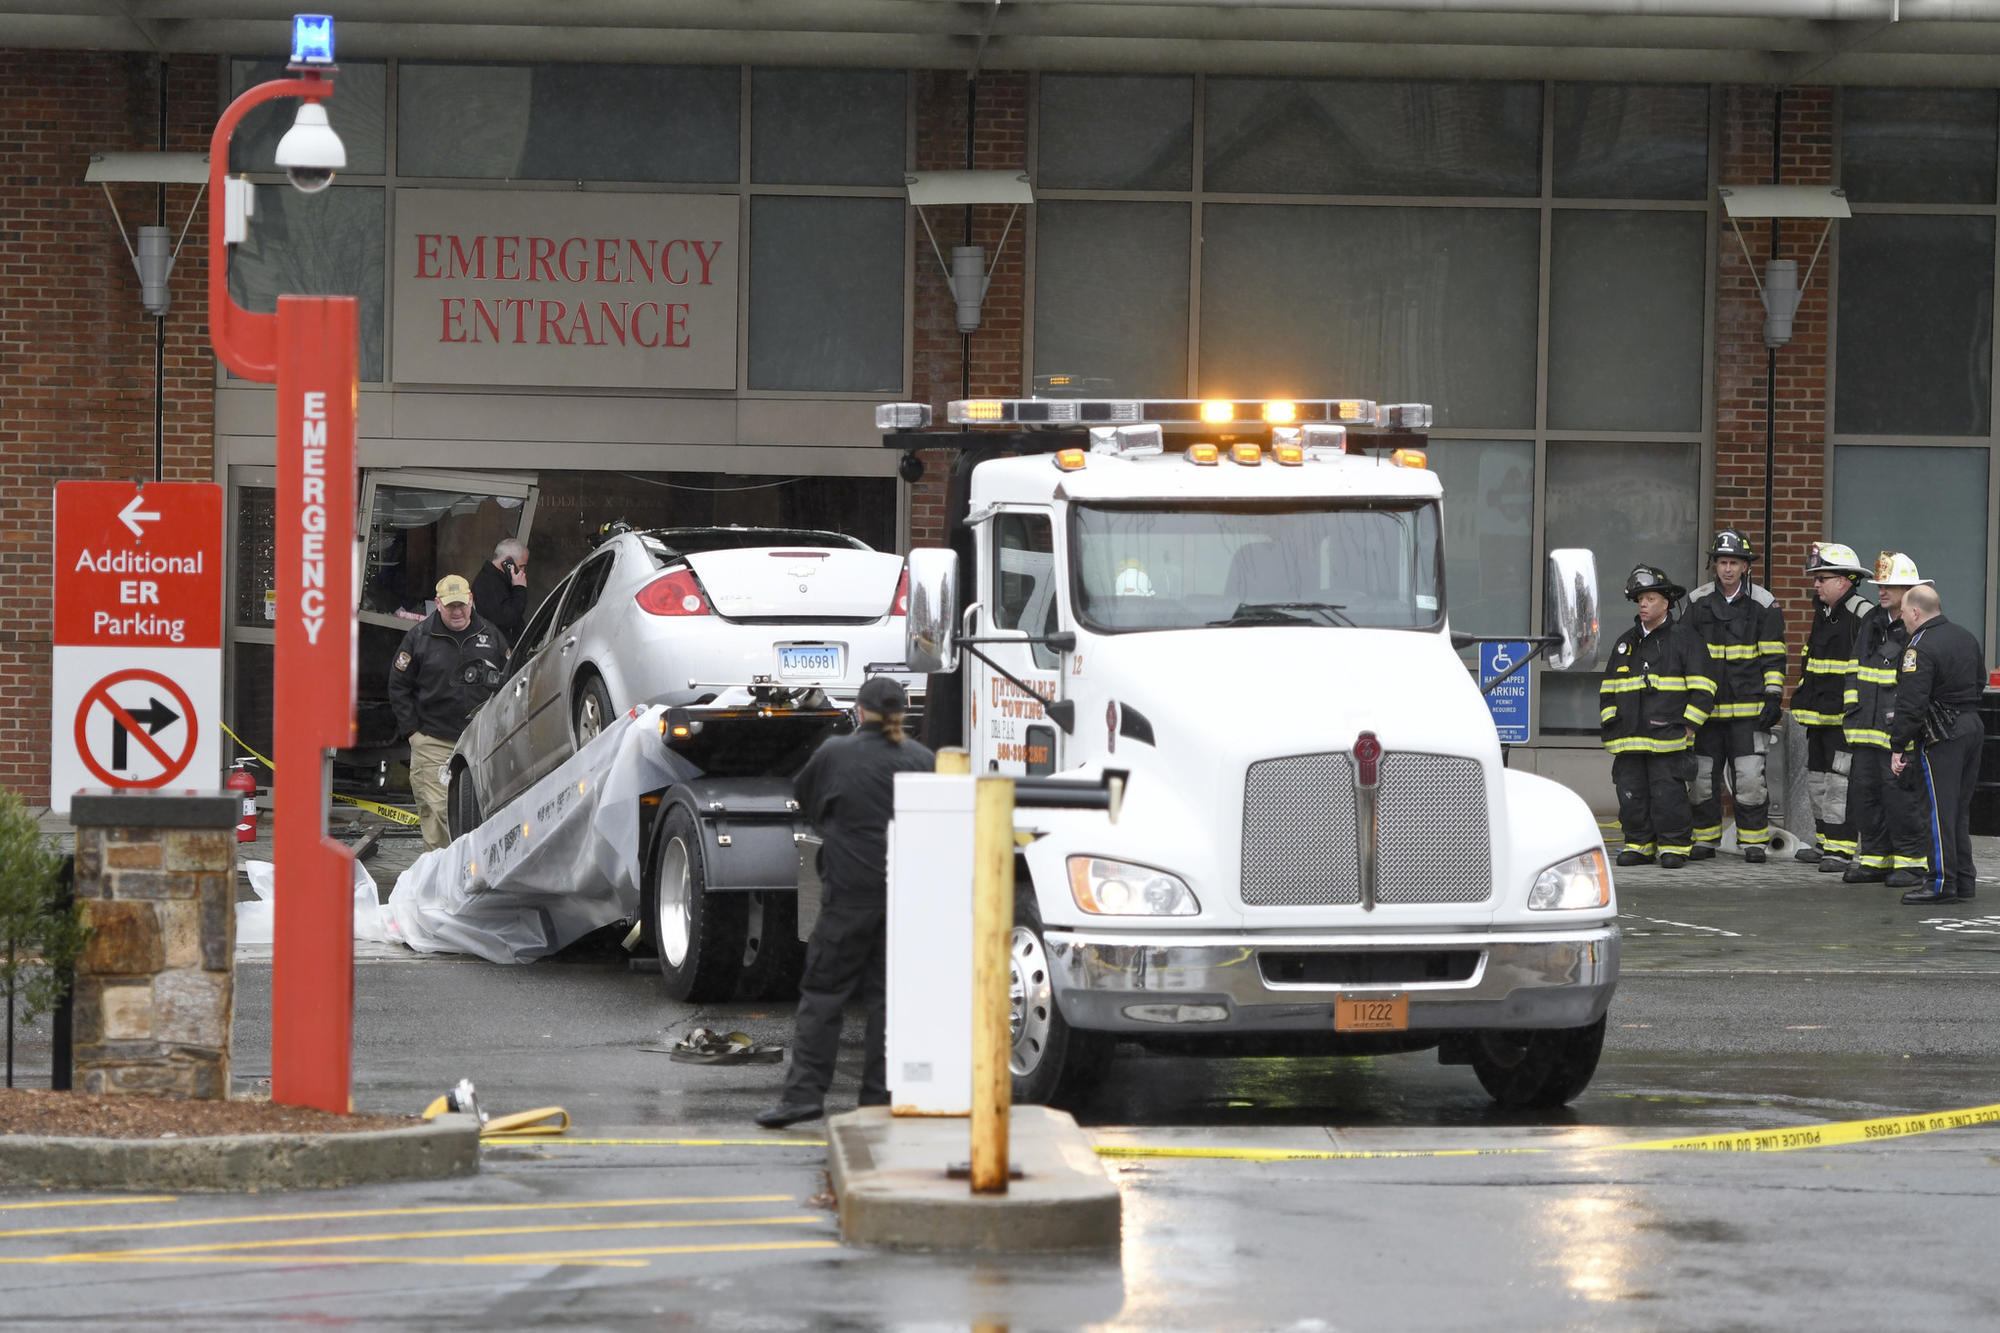 Mayor: Man Drove Car Into Middlesex Hospital Entrance, Set Himself On Fire